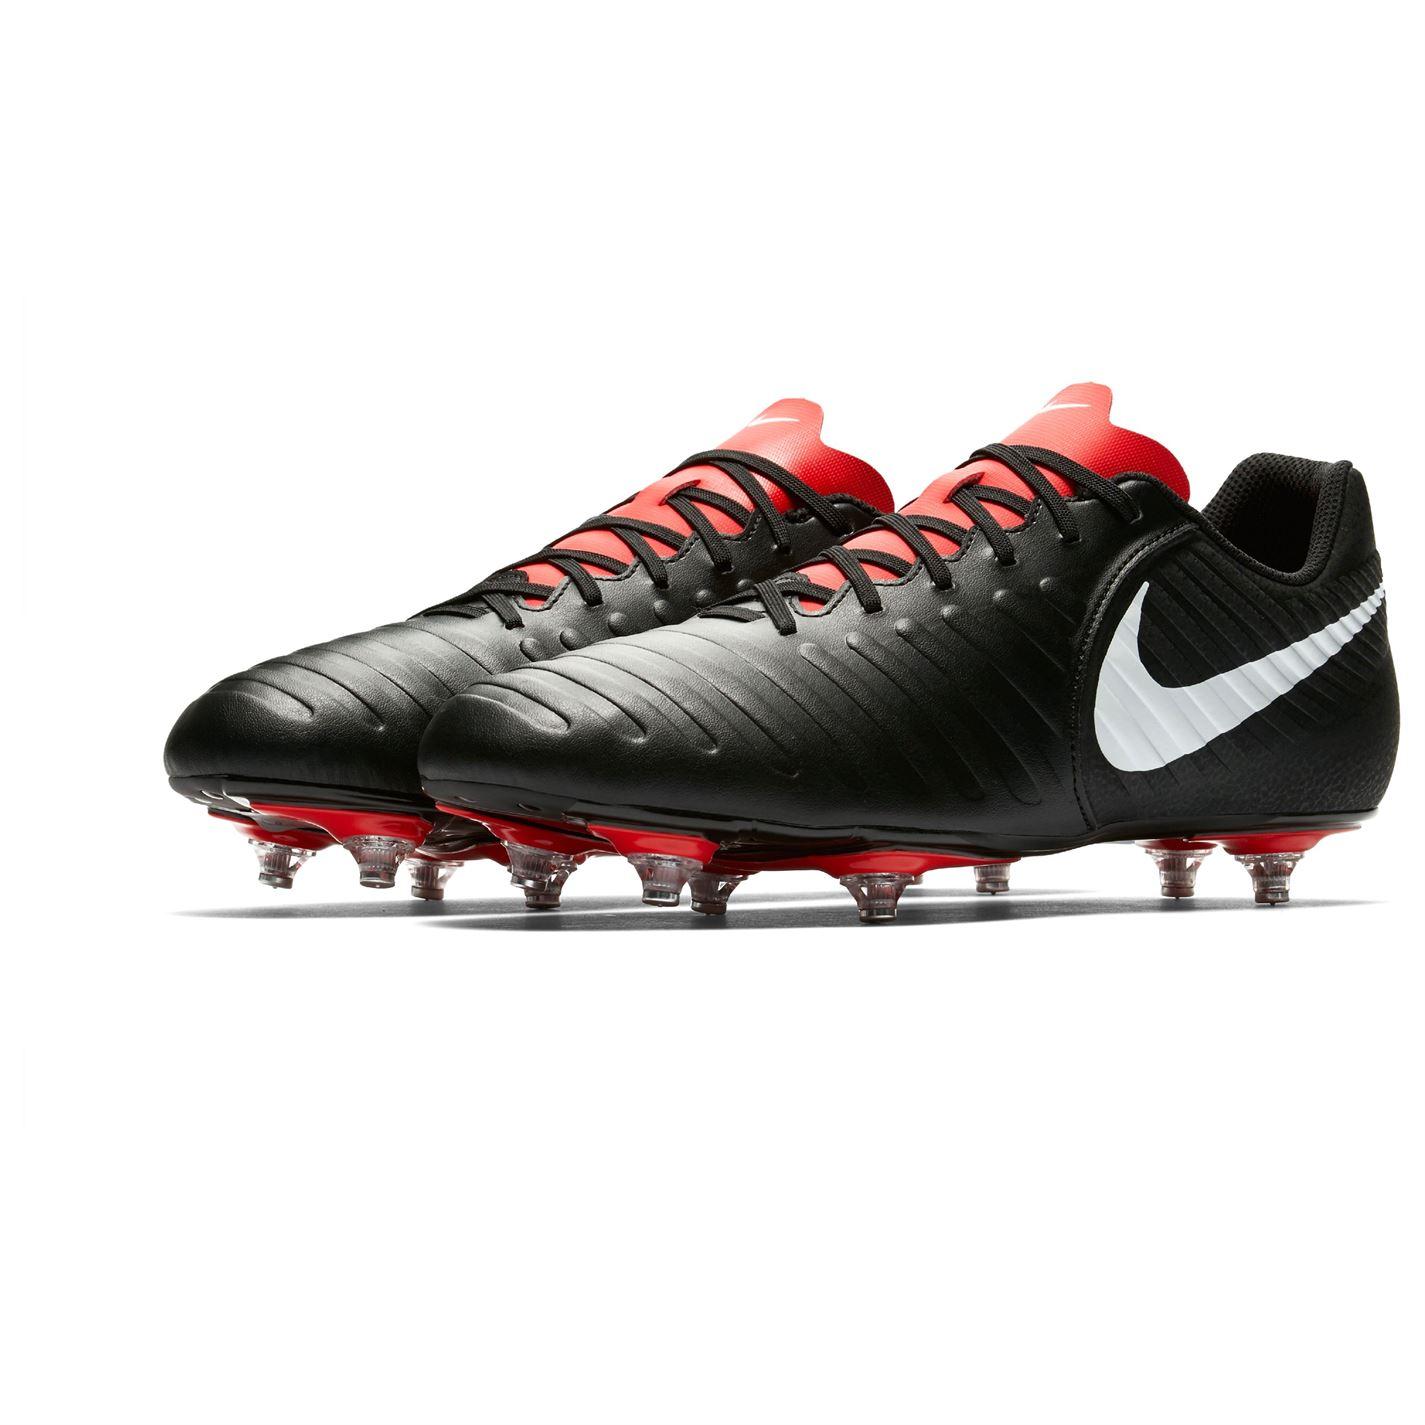 Nike Tiempo Club SG Sn99